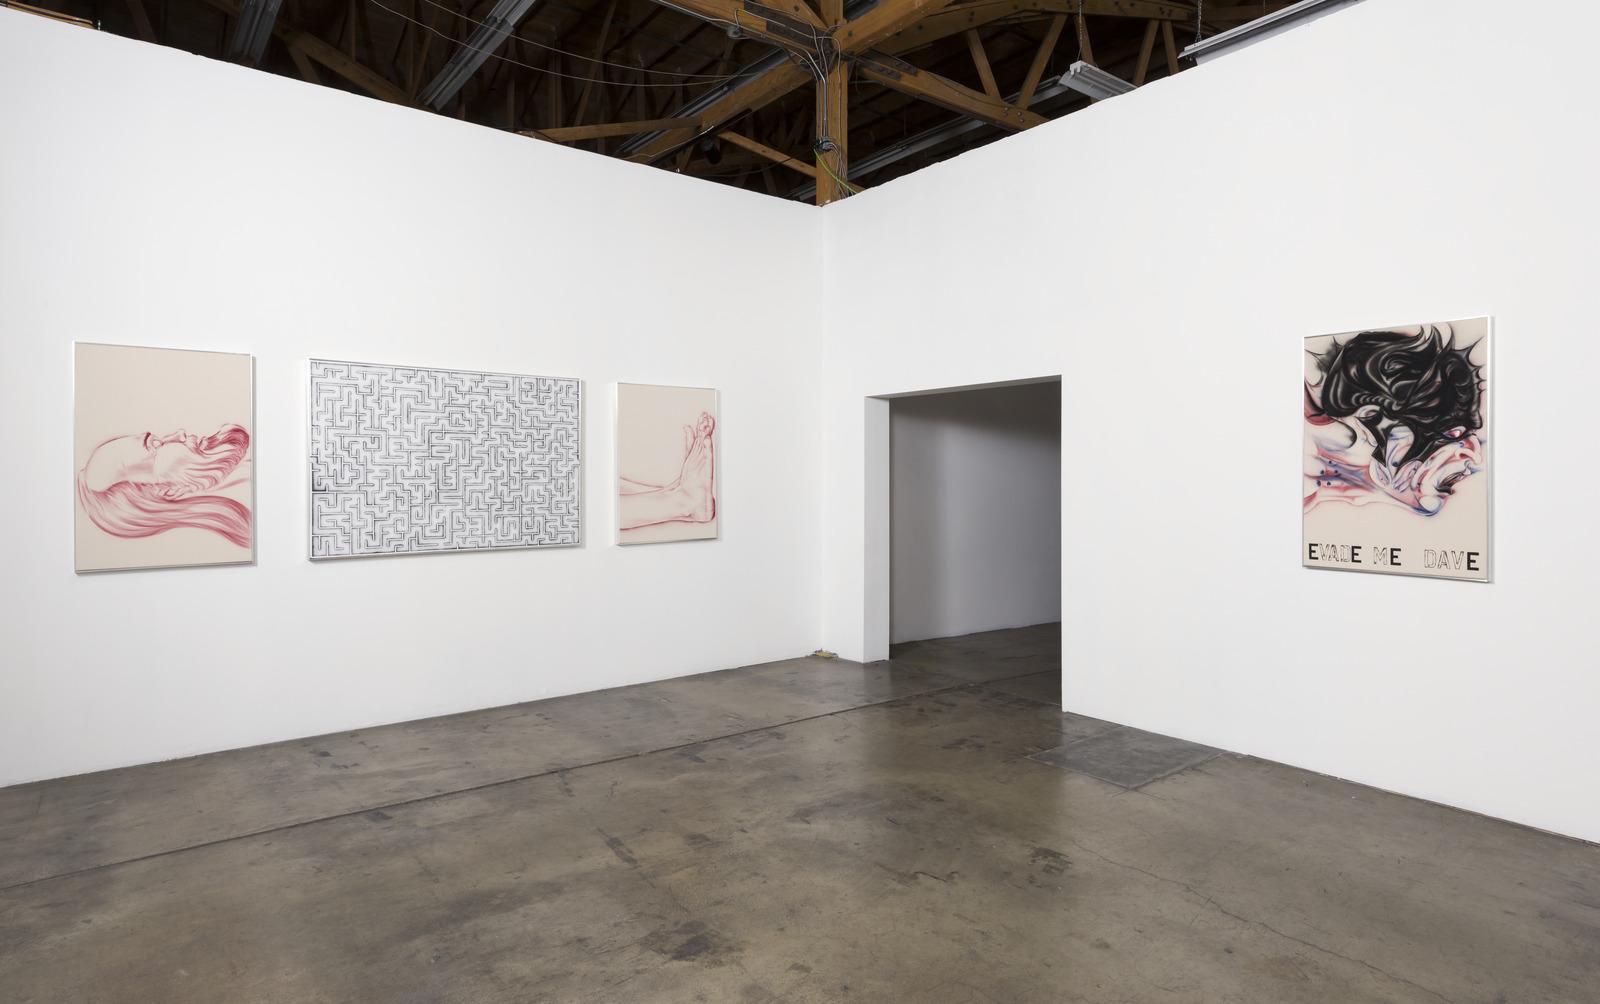 4_Installation View, Zoe Barcza, DR AWKWARD, Ghebaly Gallery